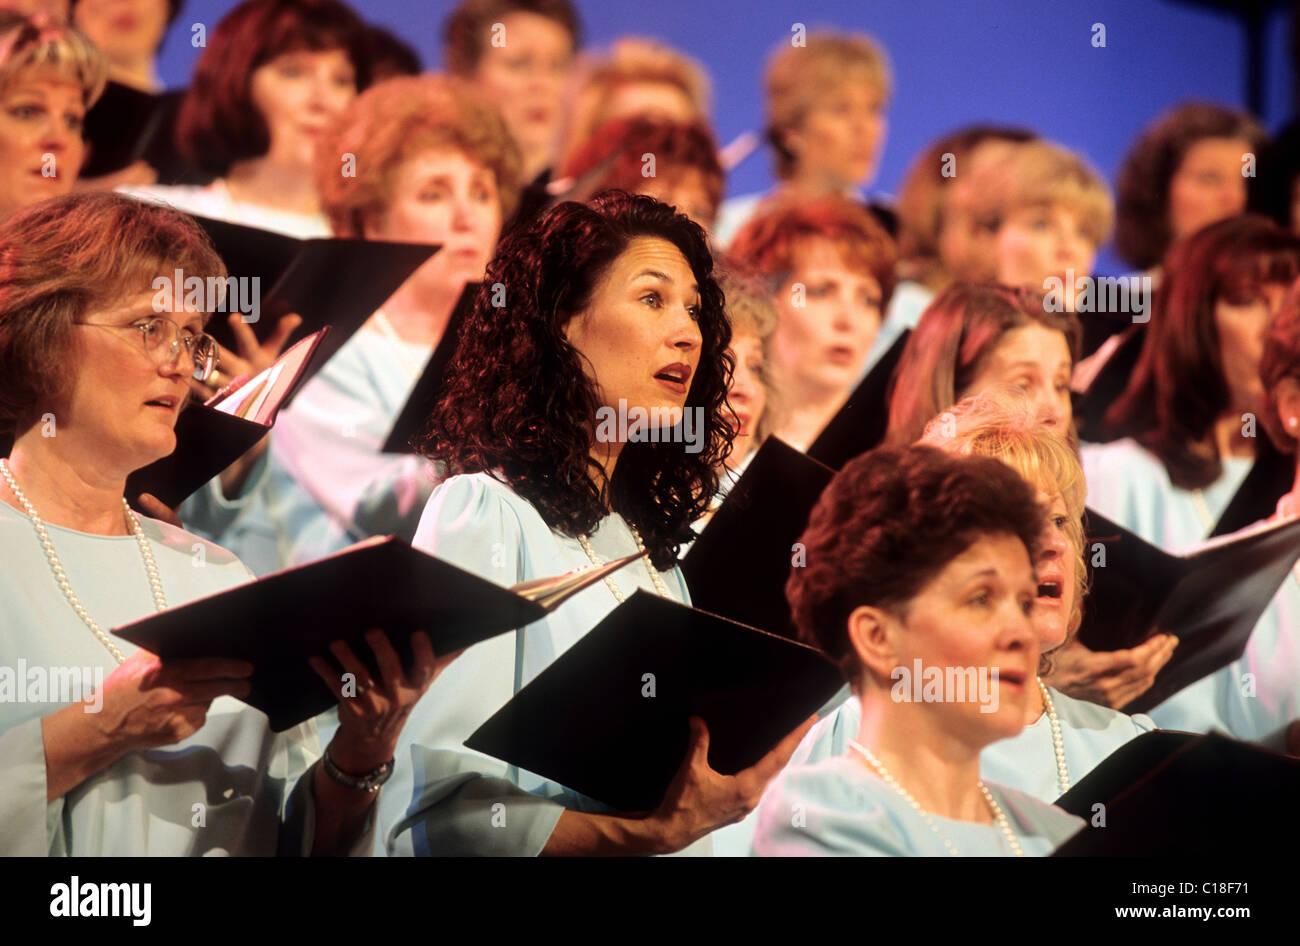 United States, Utah, Salt Lake City, Mormon Choir at the Tabernacle - Stock Image